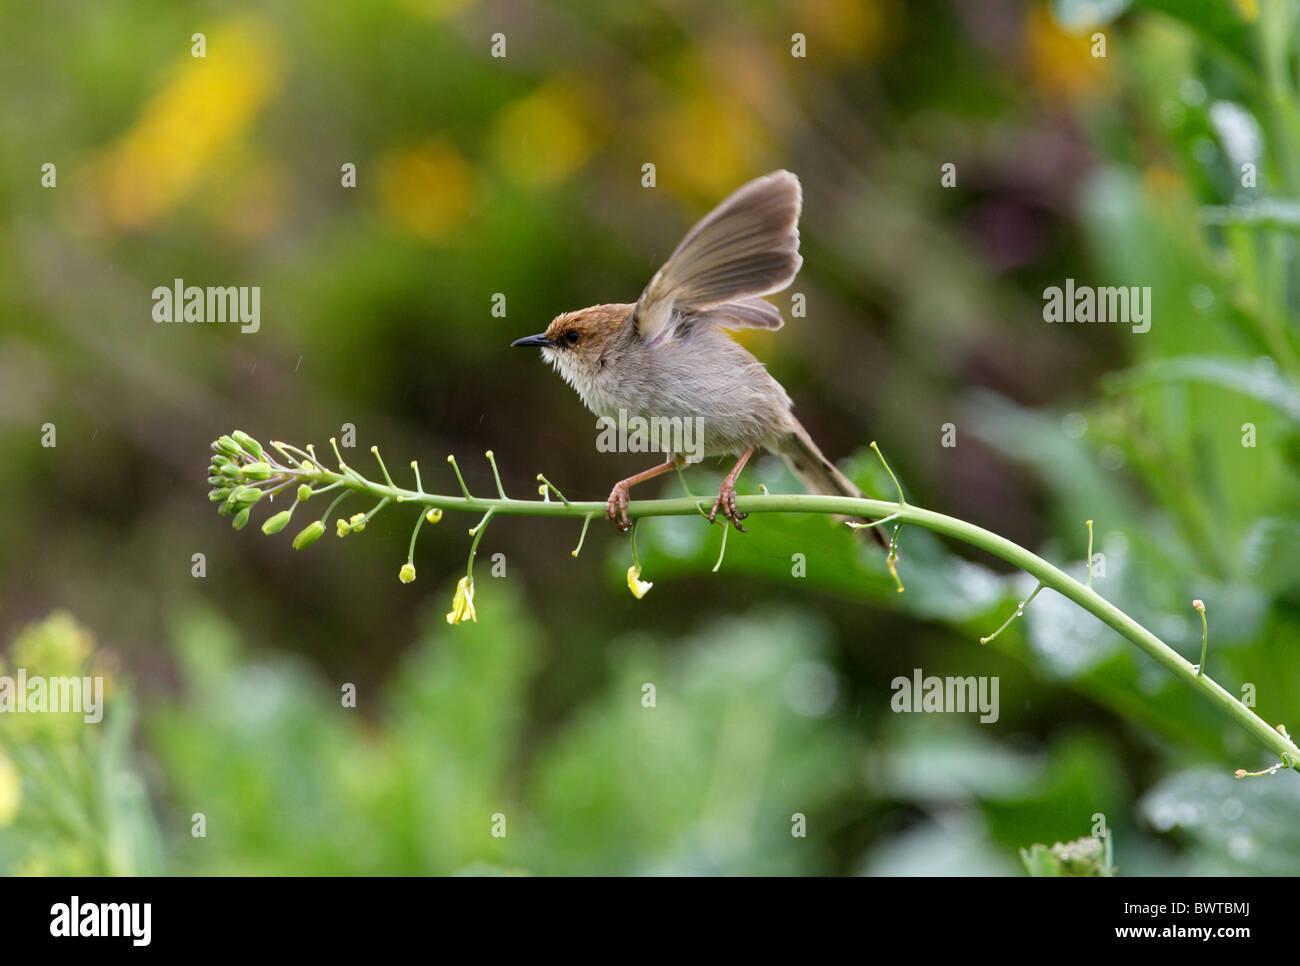 Hunter's Cisticola (Cisticola hunteri) immature, wing flapping in rain, perched on stem, Kenya, october - Stock Image